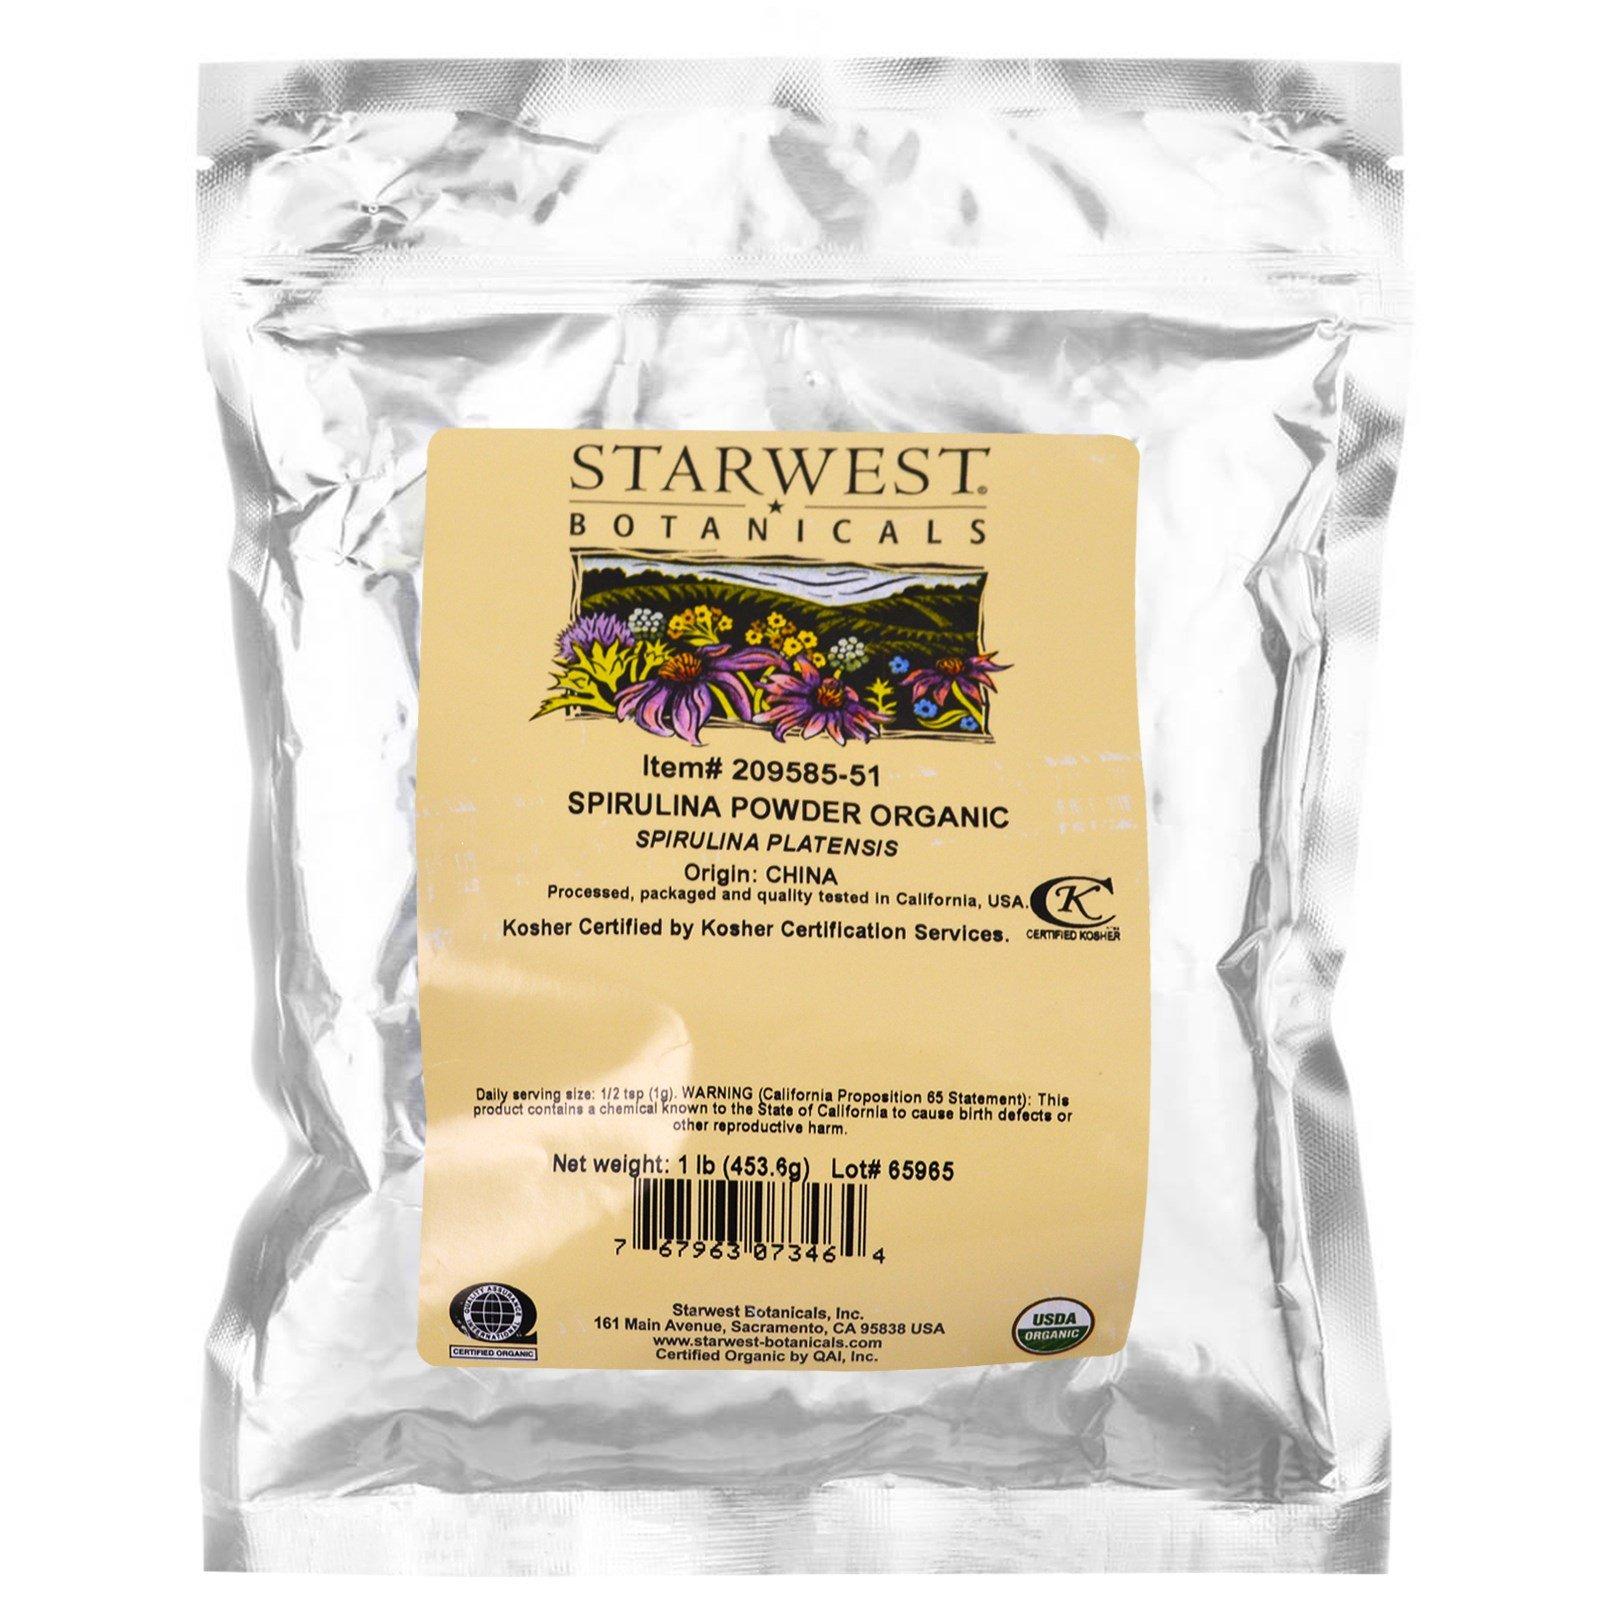 Starwest Botanicals, Spirulina Powder, Organic, 1 lb (453.6 g) - 3PC